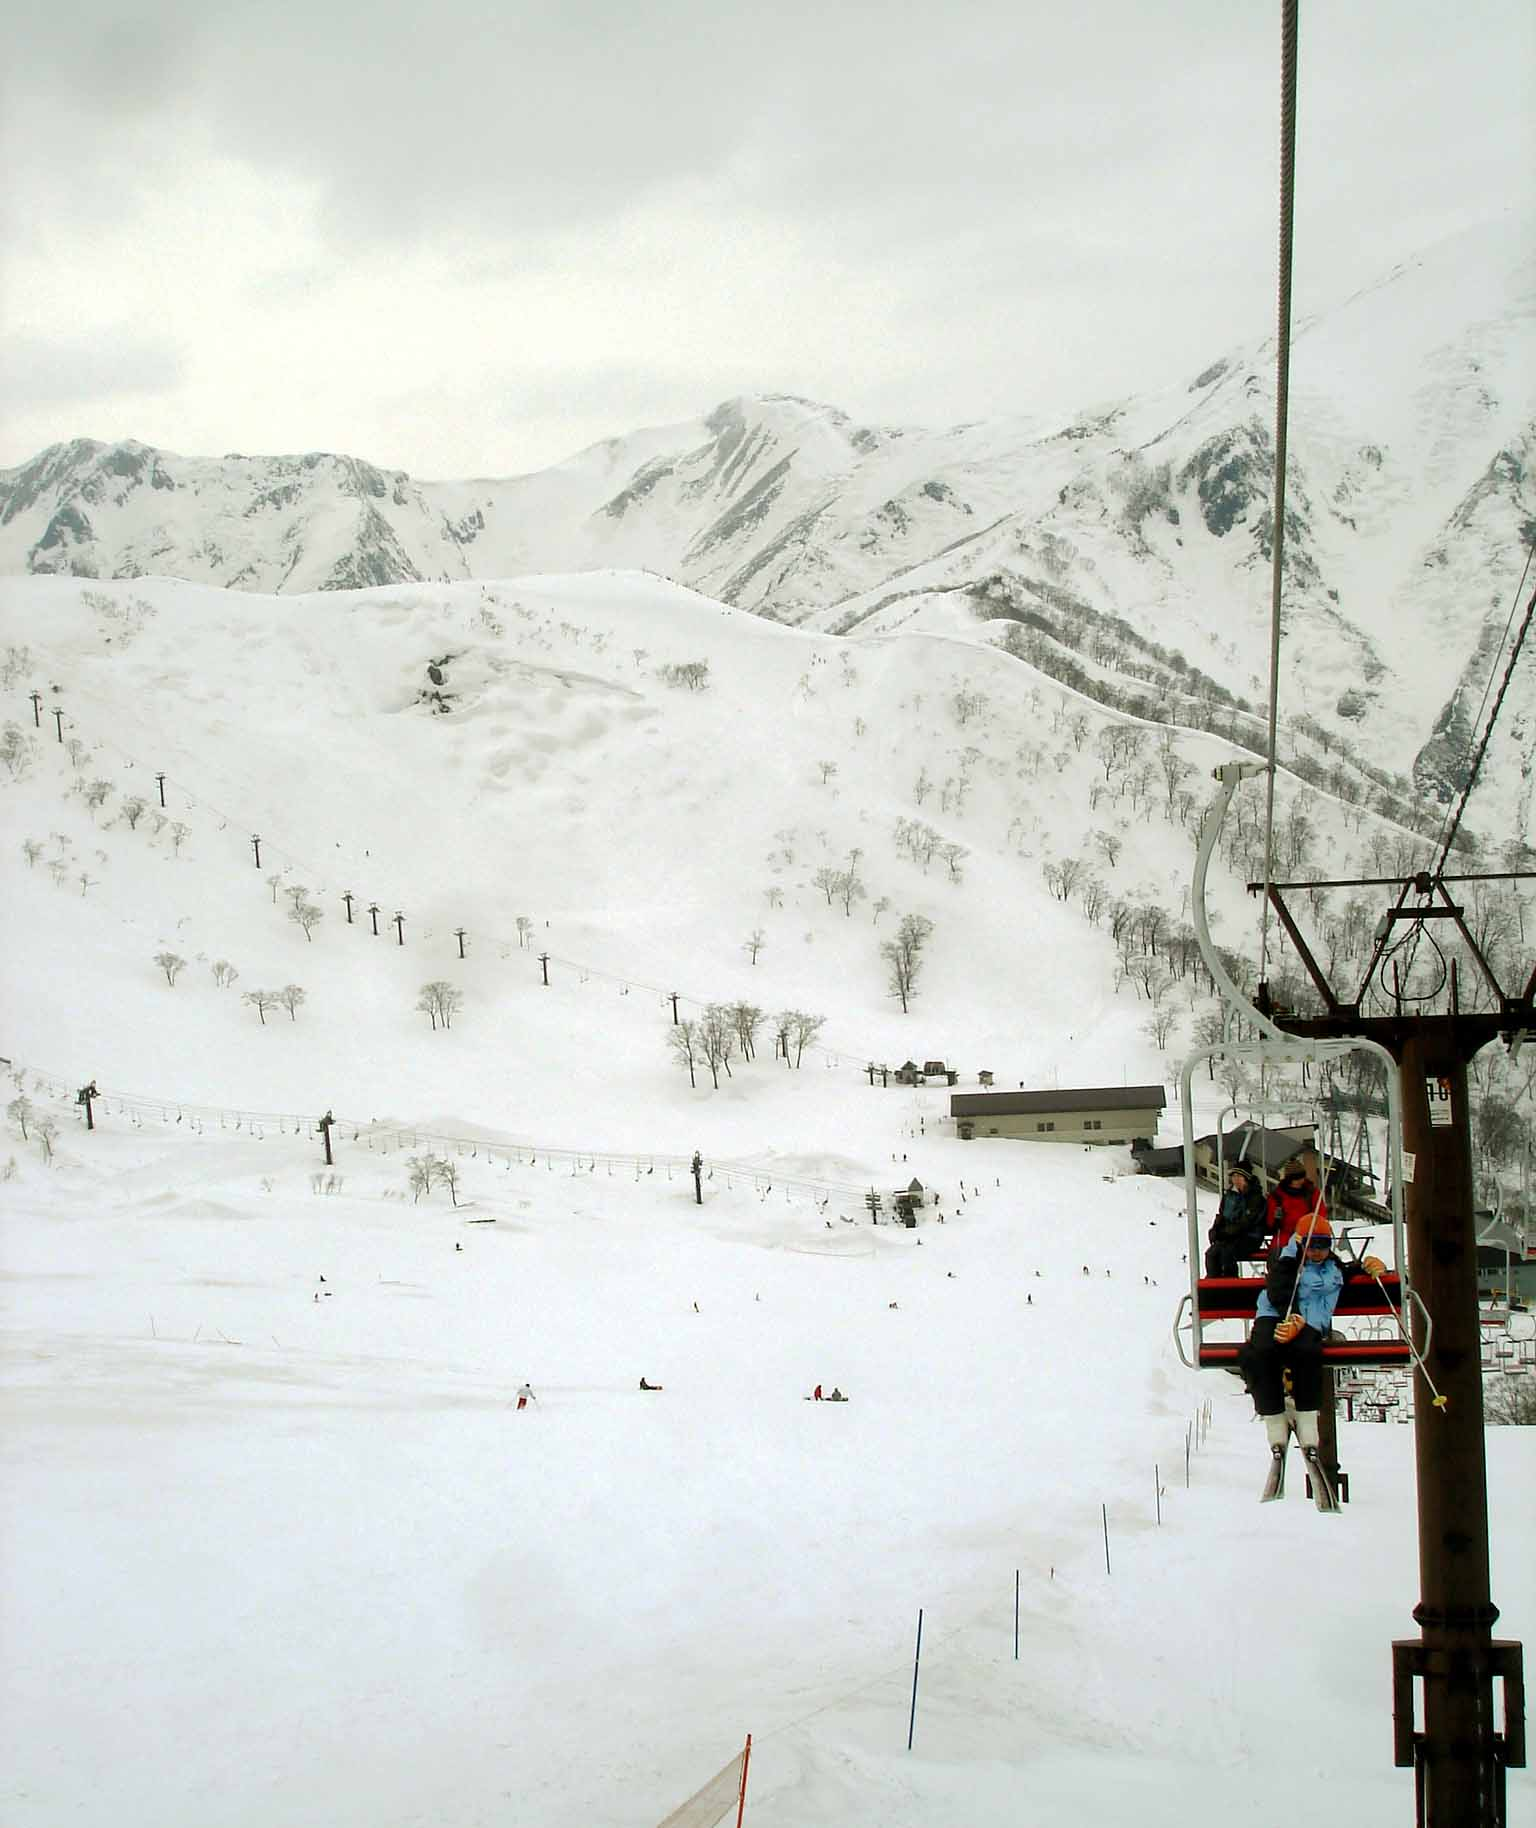 Dsc00338 スキーリフトより